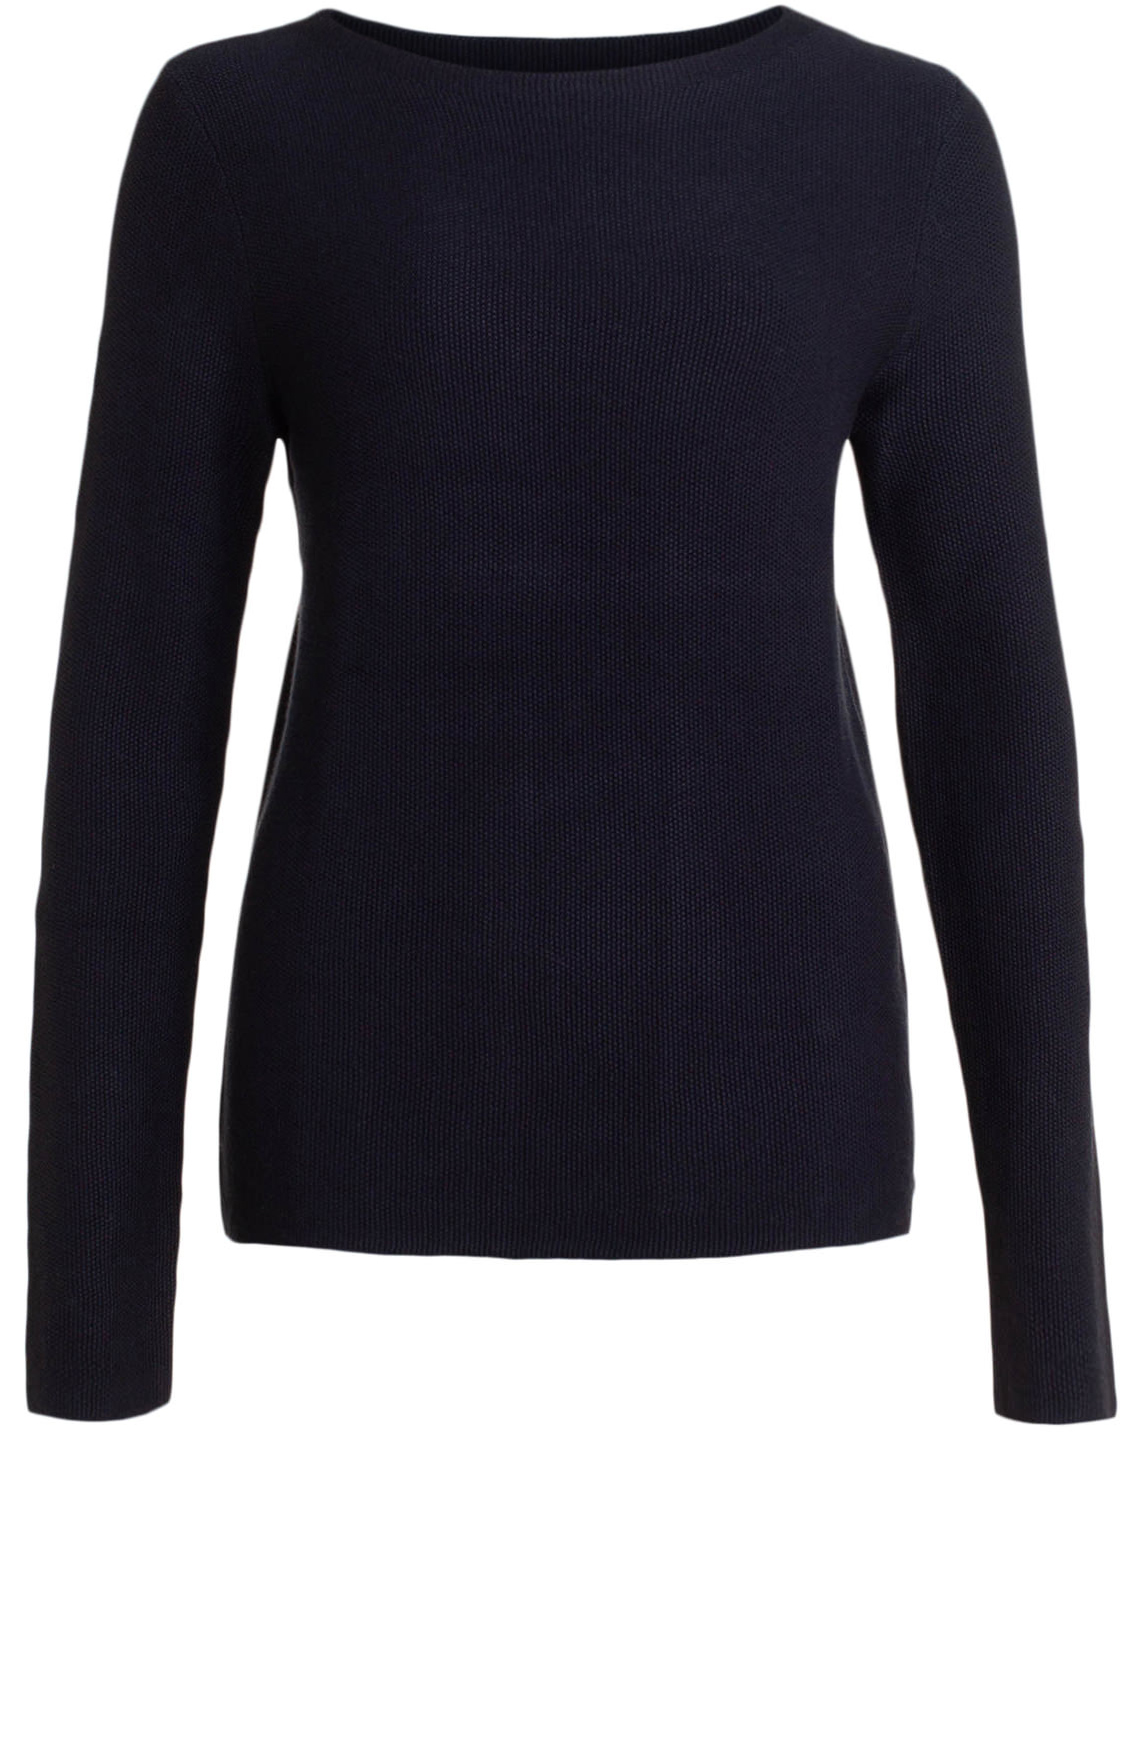 Marc O'Polo Dames Pullover met fijne structuur Blauw